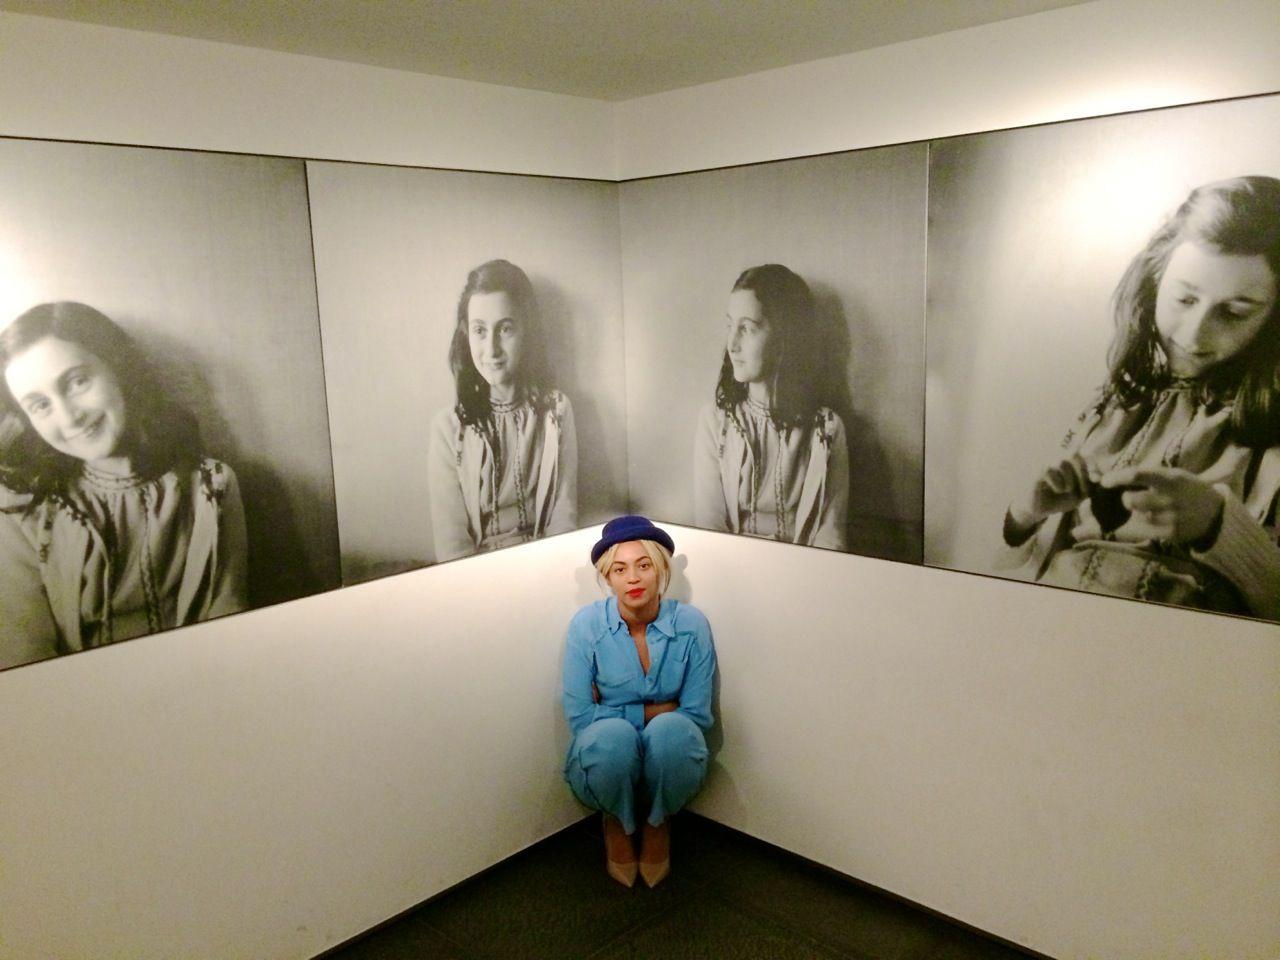 Beyoncé At Anne Frank Museum 19.03.2014 | Anne frank, Anne ...